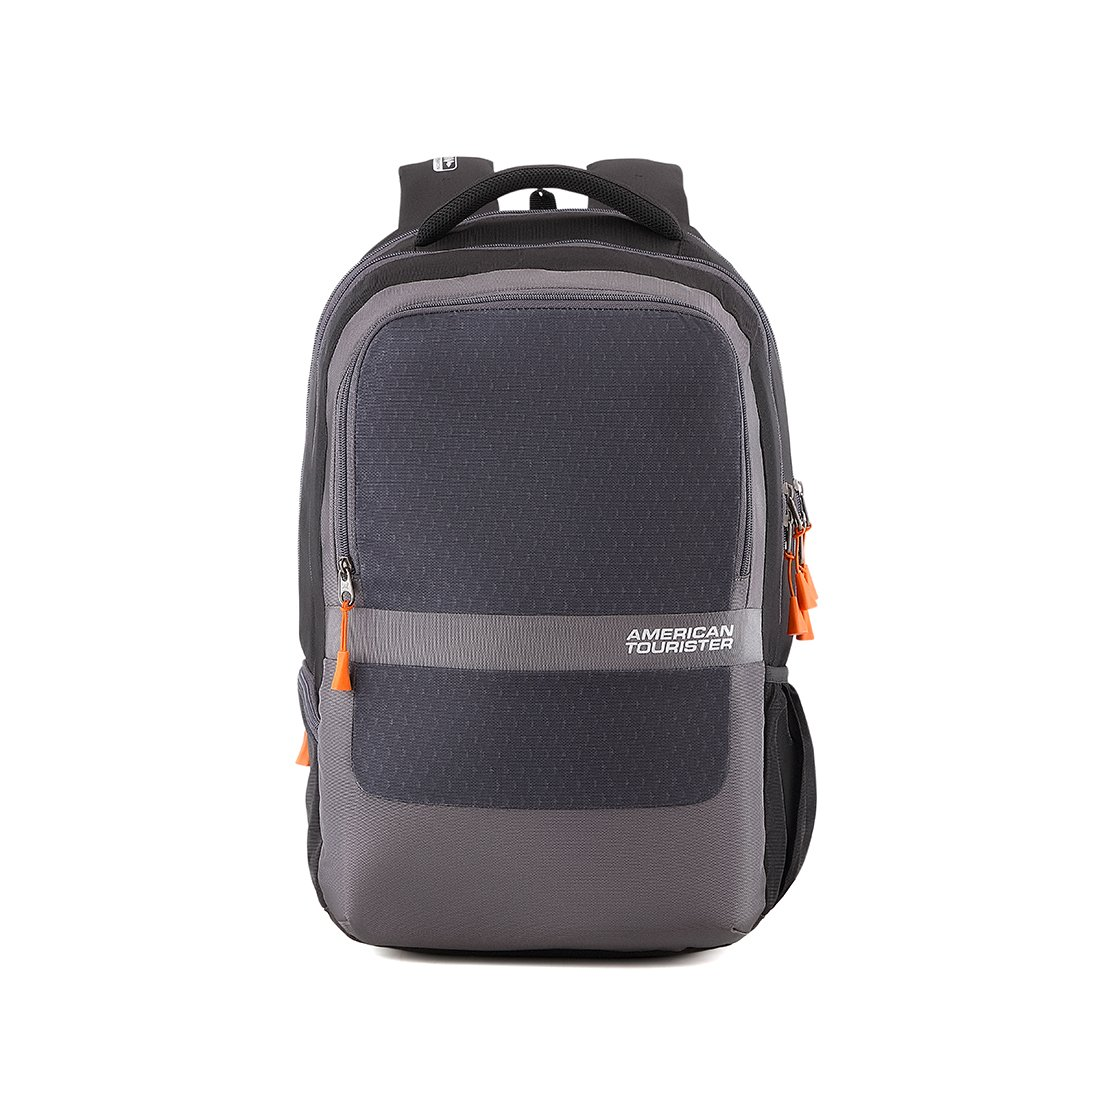 American Tourister 29 Ltrs Black Laptop Backpack